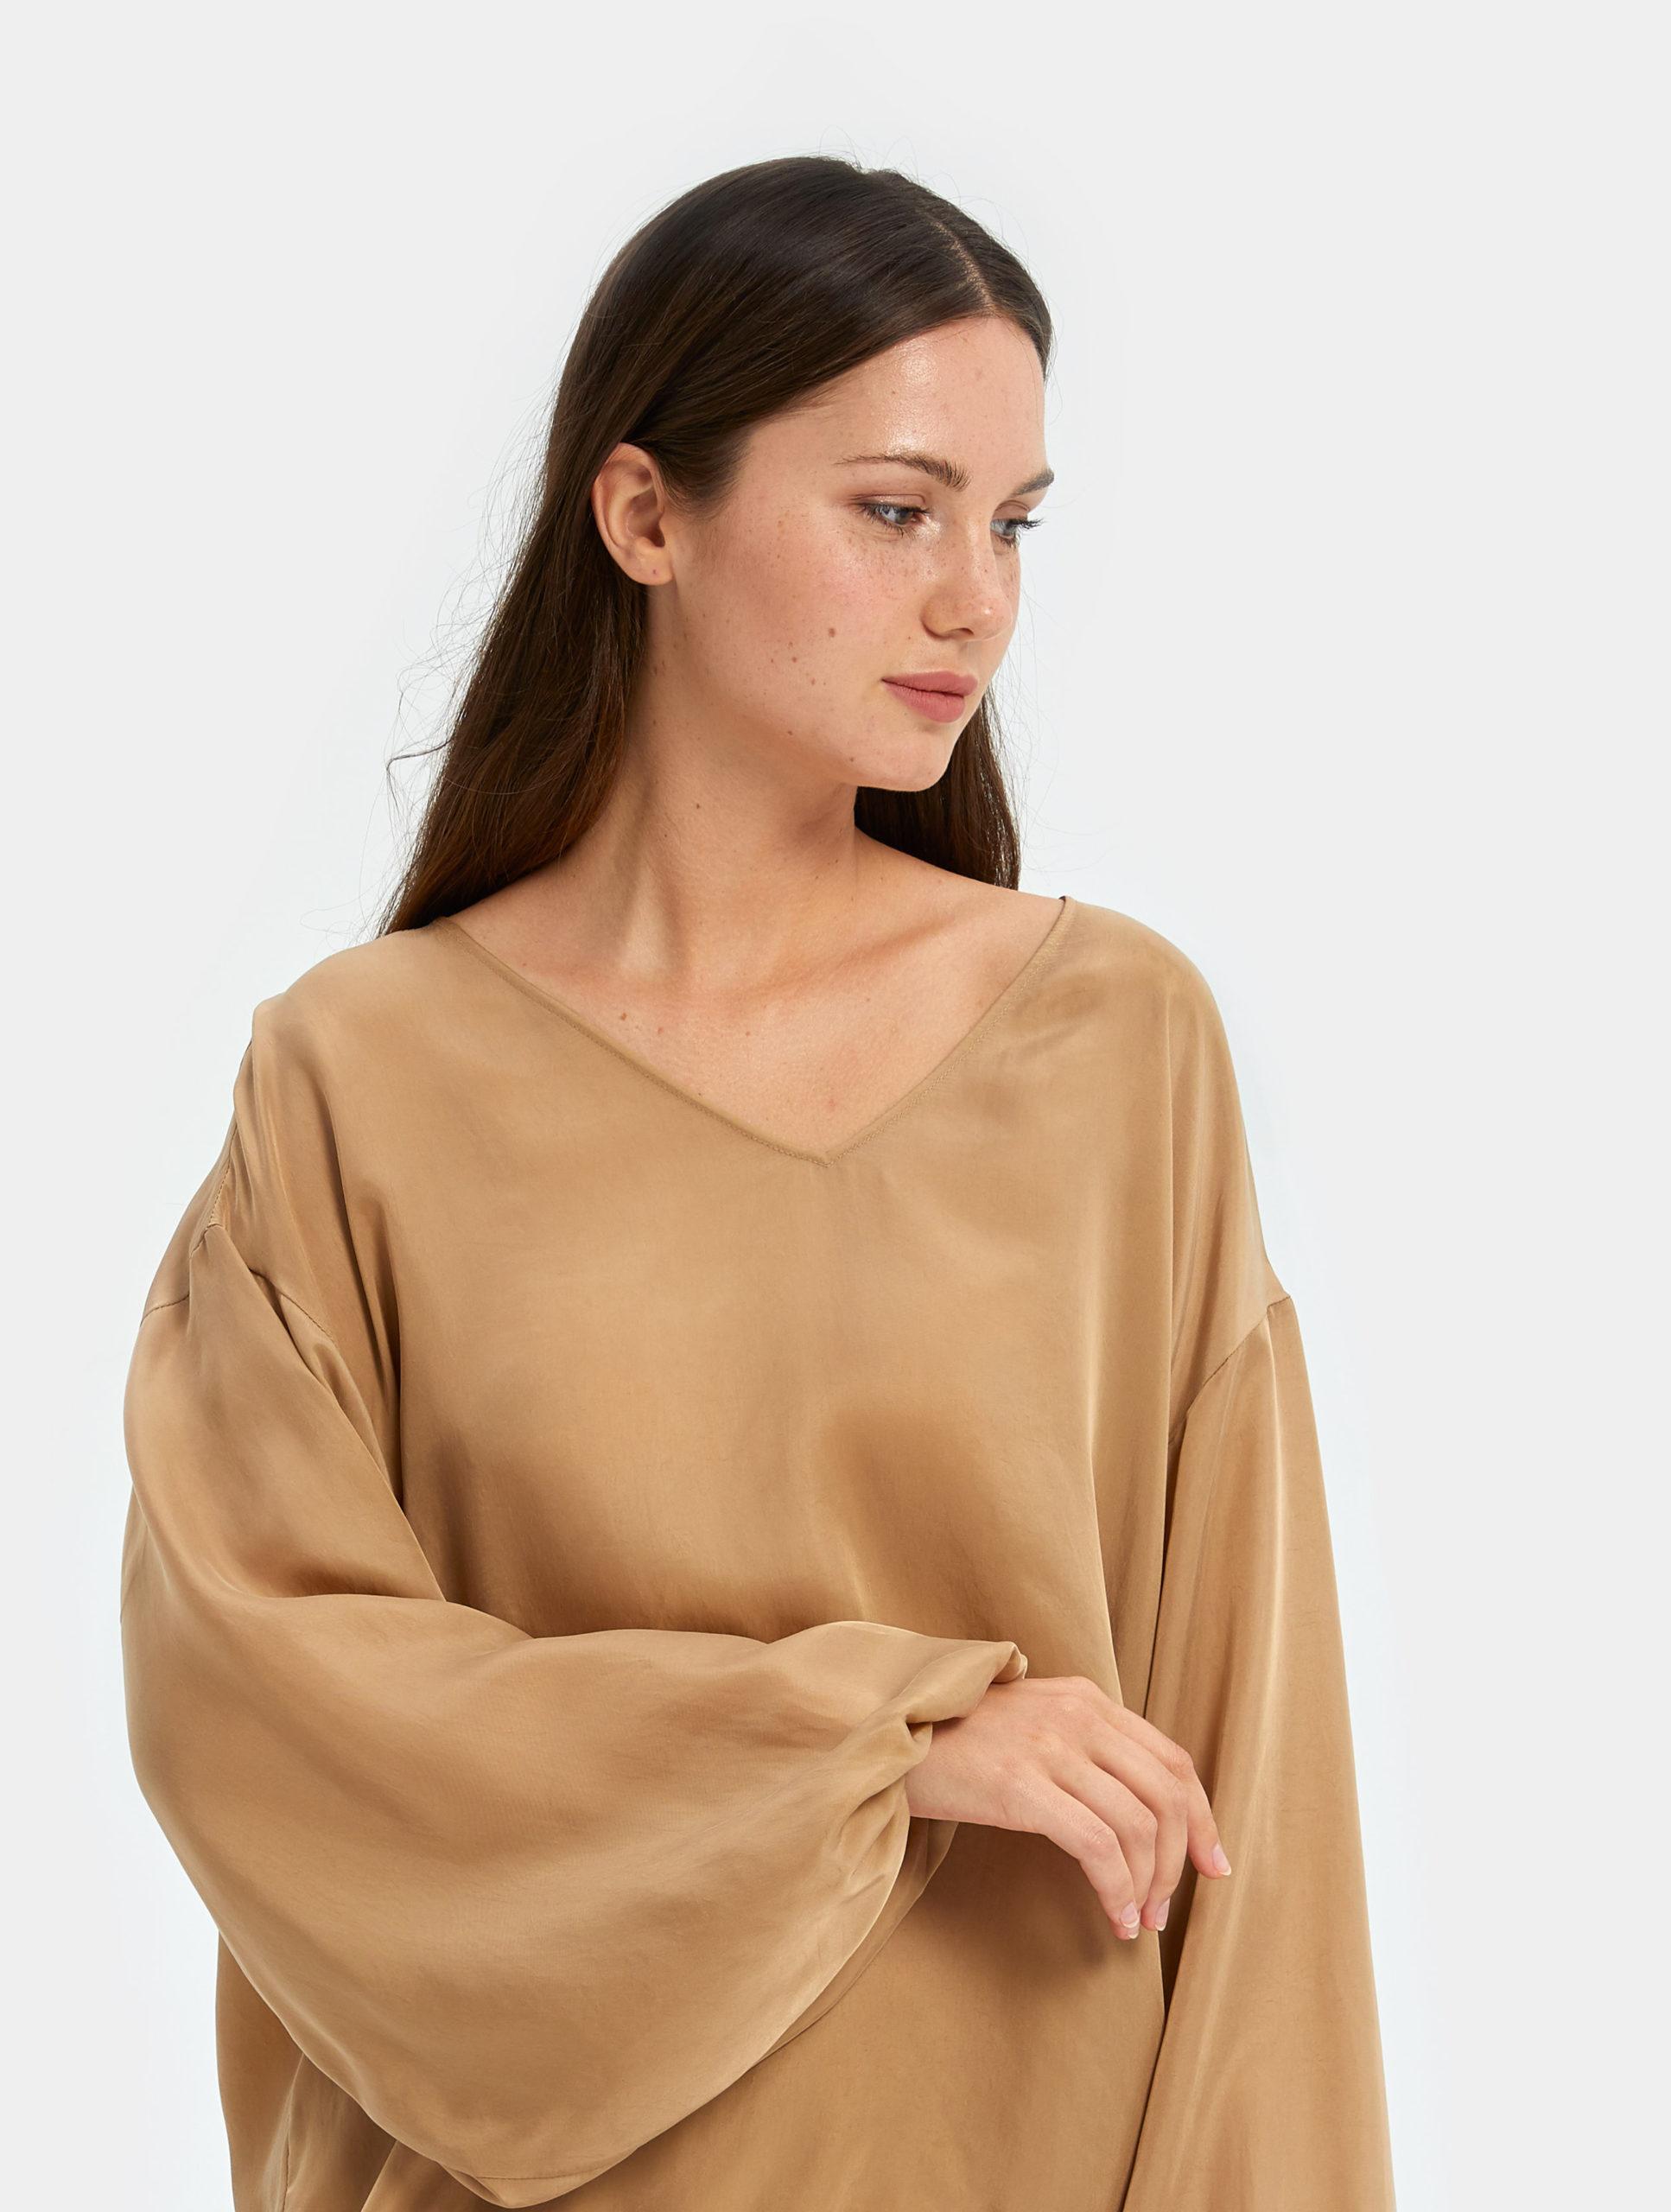 Women's Sleepwear   Puff Sleeve Top   Nap - The Luxury Sleepwear